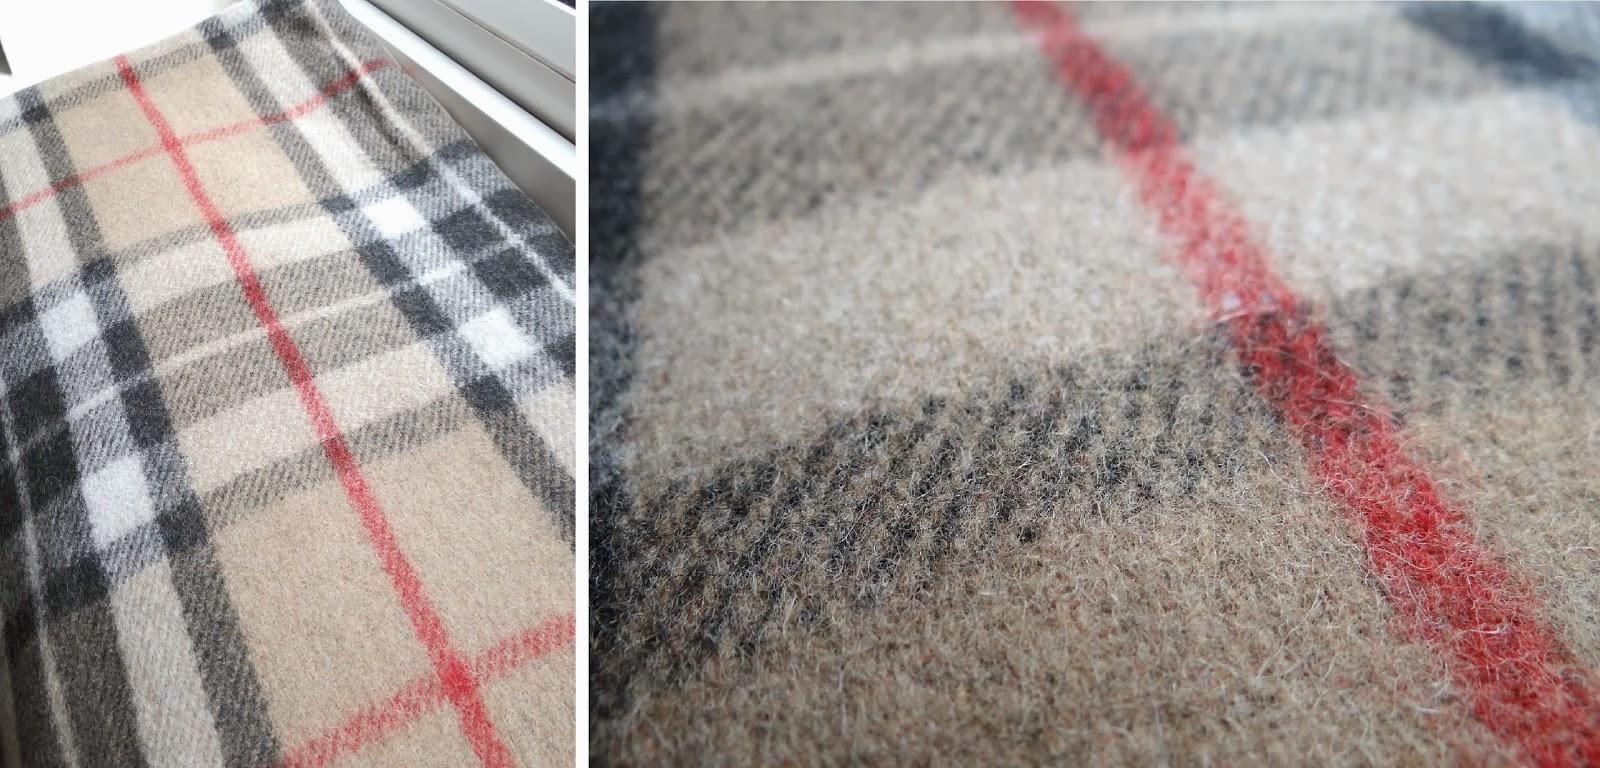 Scotland Tartan rugs, Scotland Souvenirs, Burberry Style